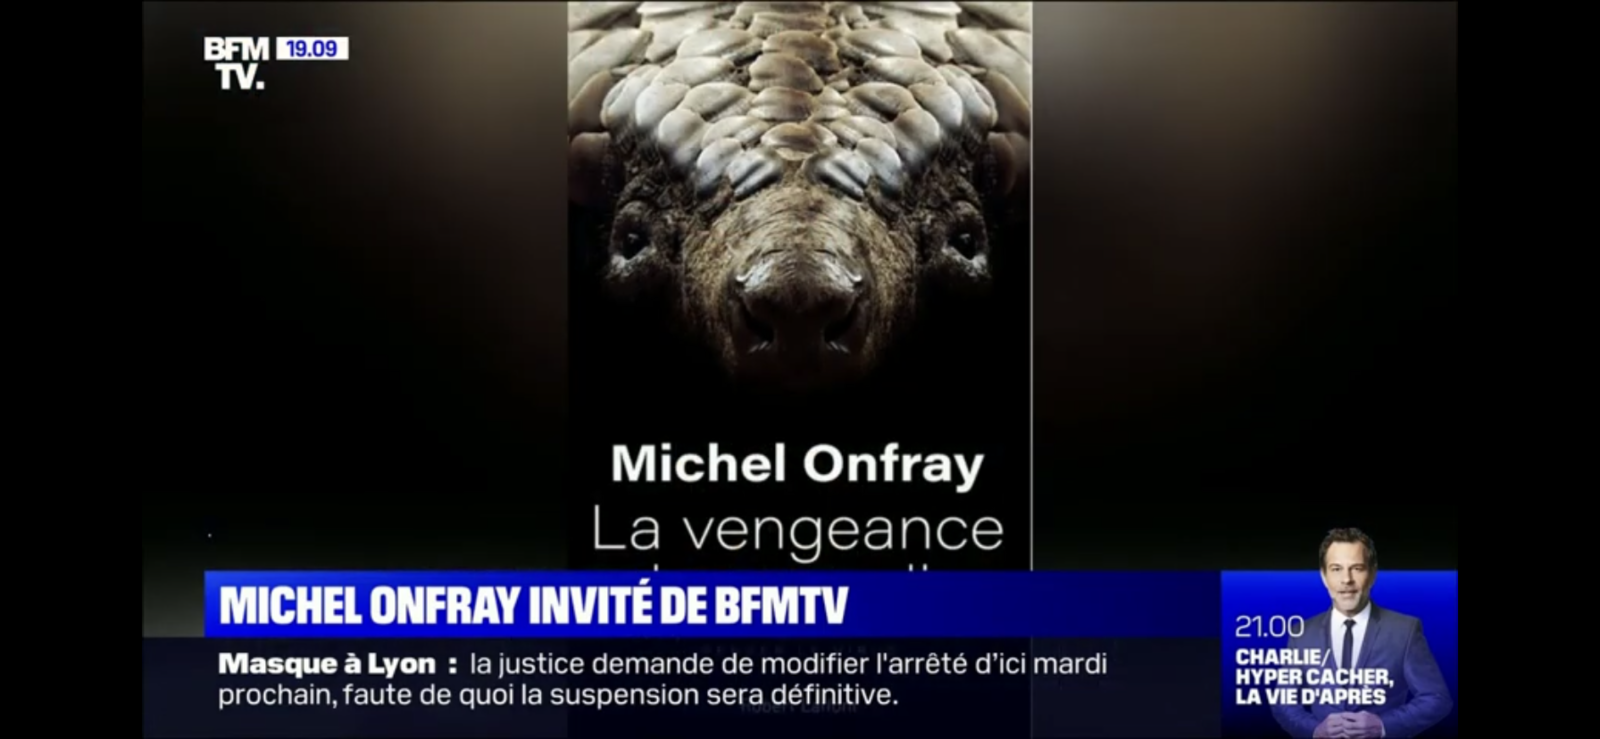 Michel Onfray - V.S.D. (BFMTV) - 05.09.2020